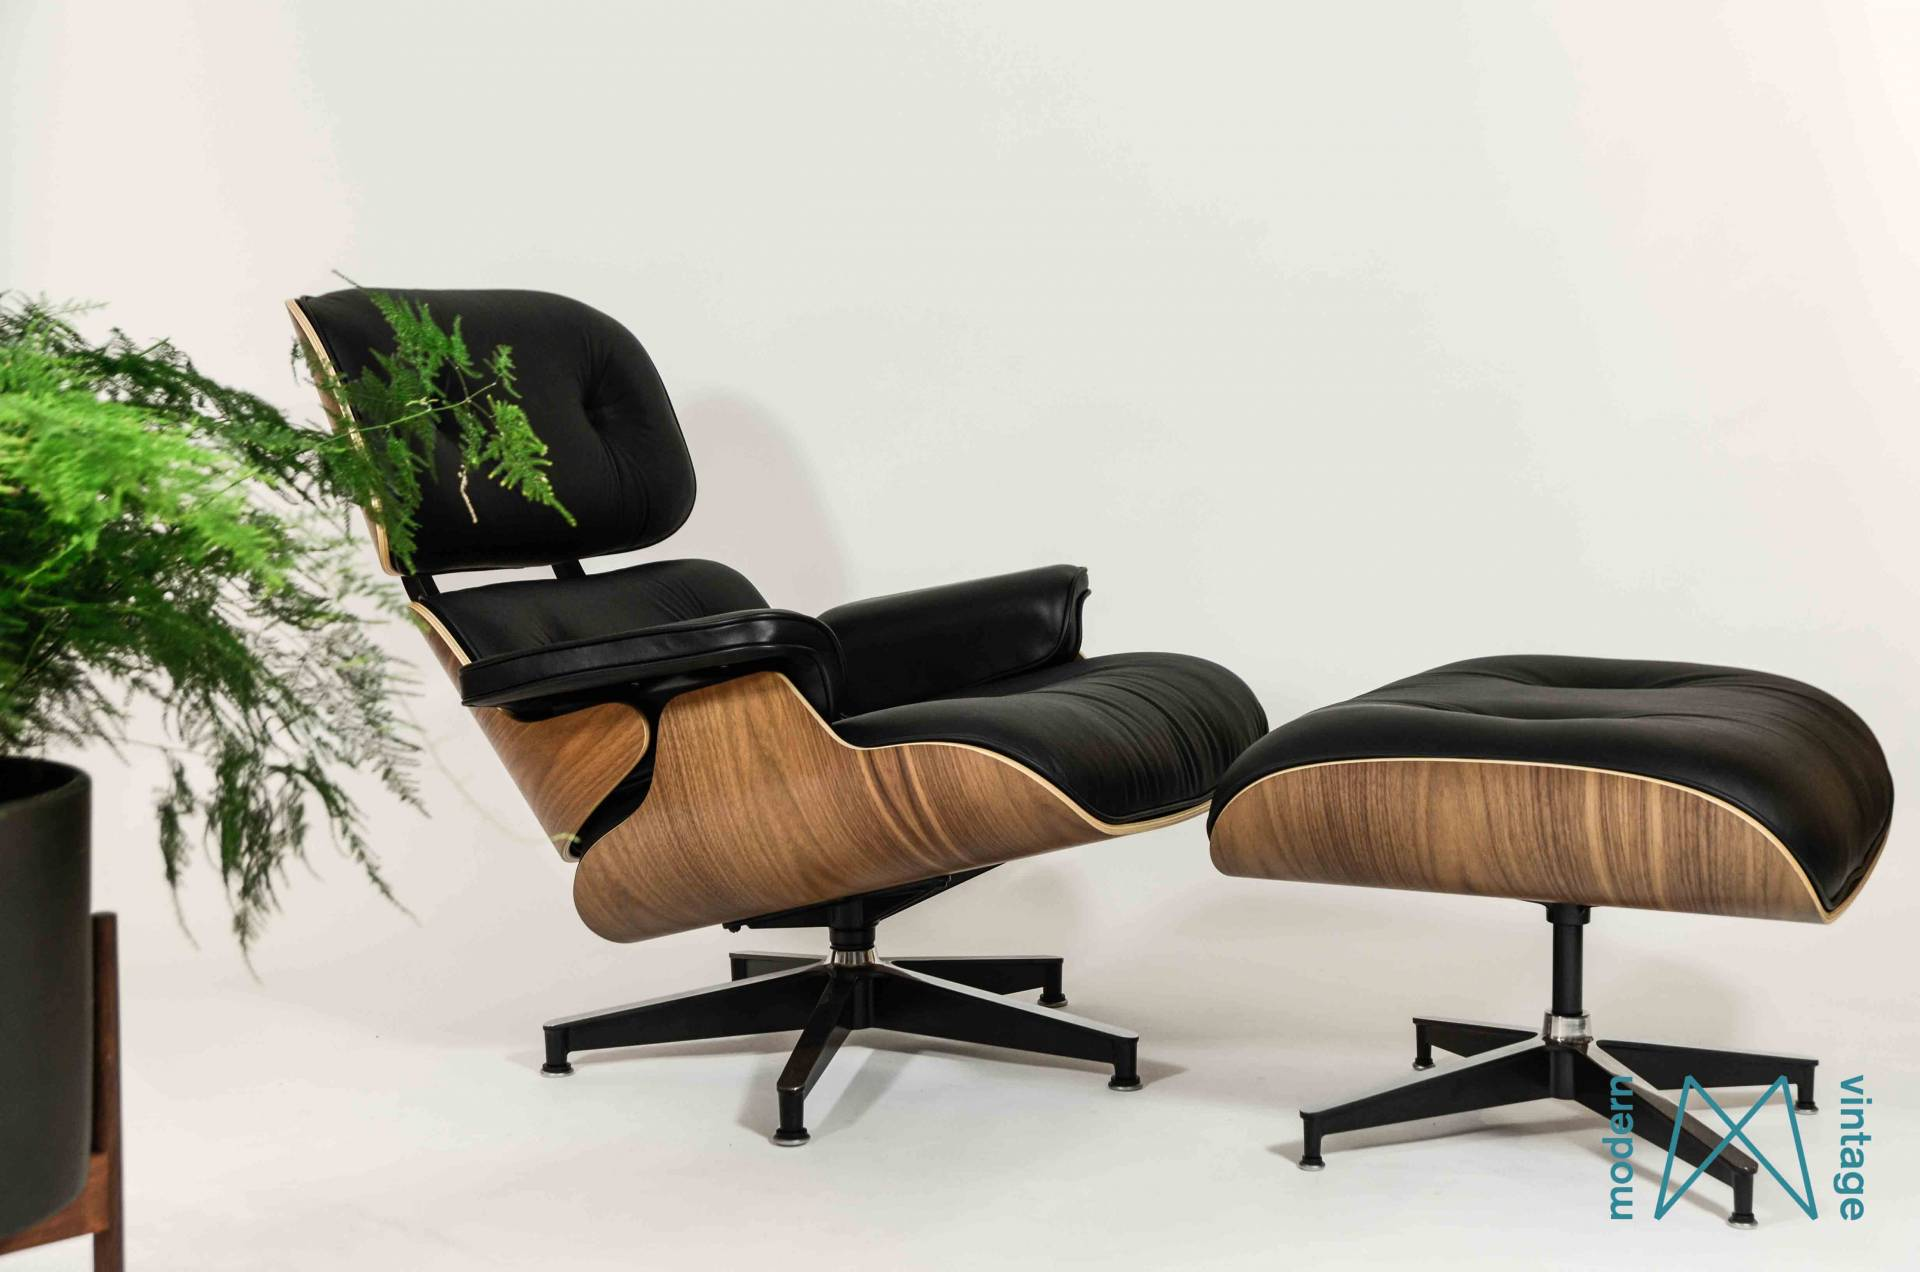 Eames Herman Miller Lounge Chair Walnut XL